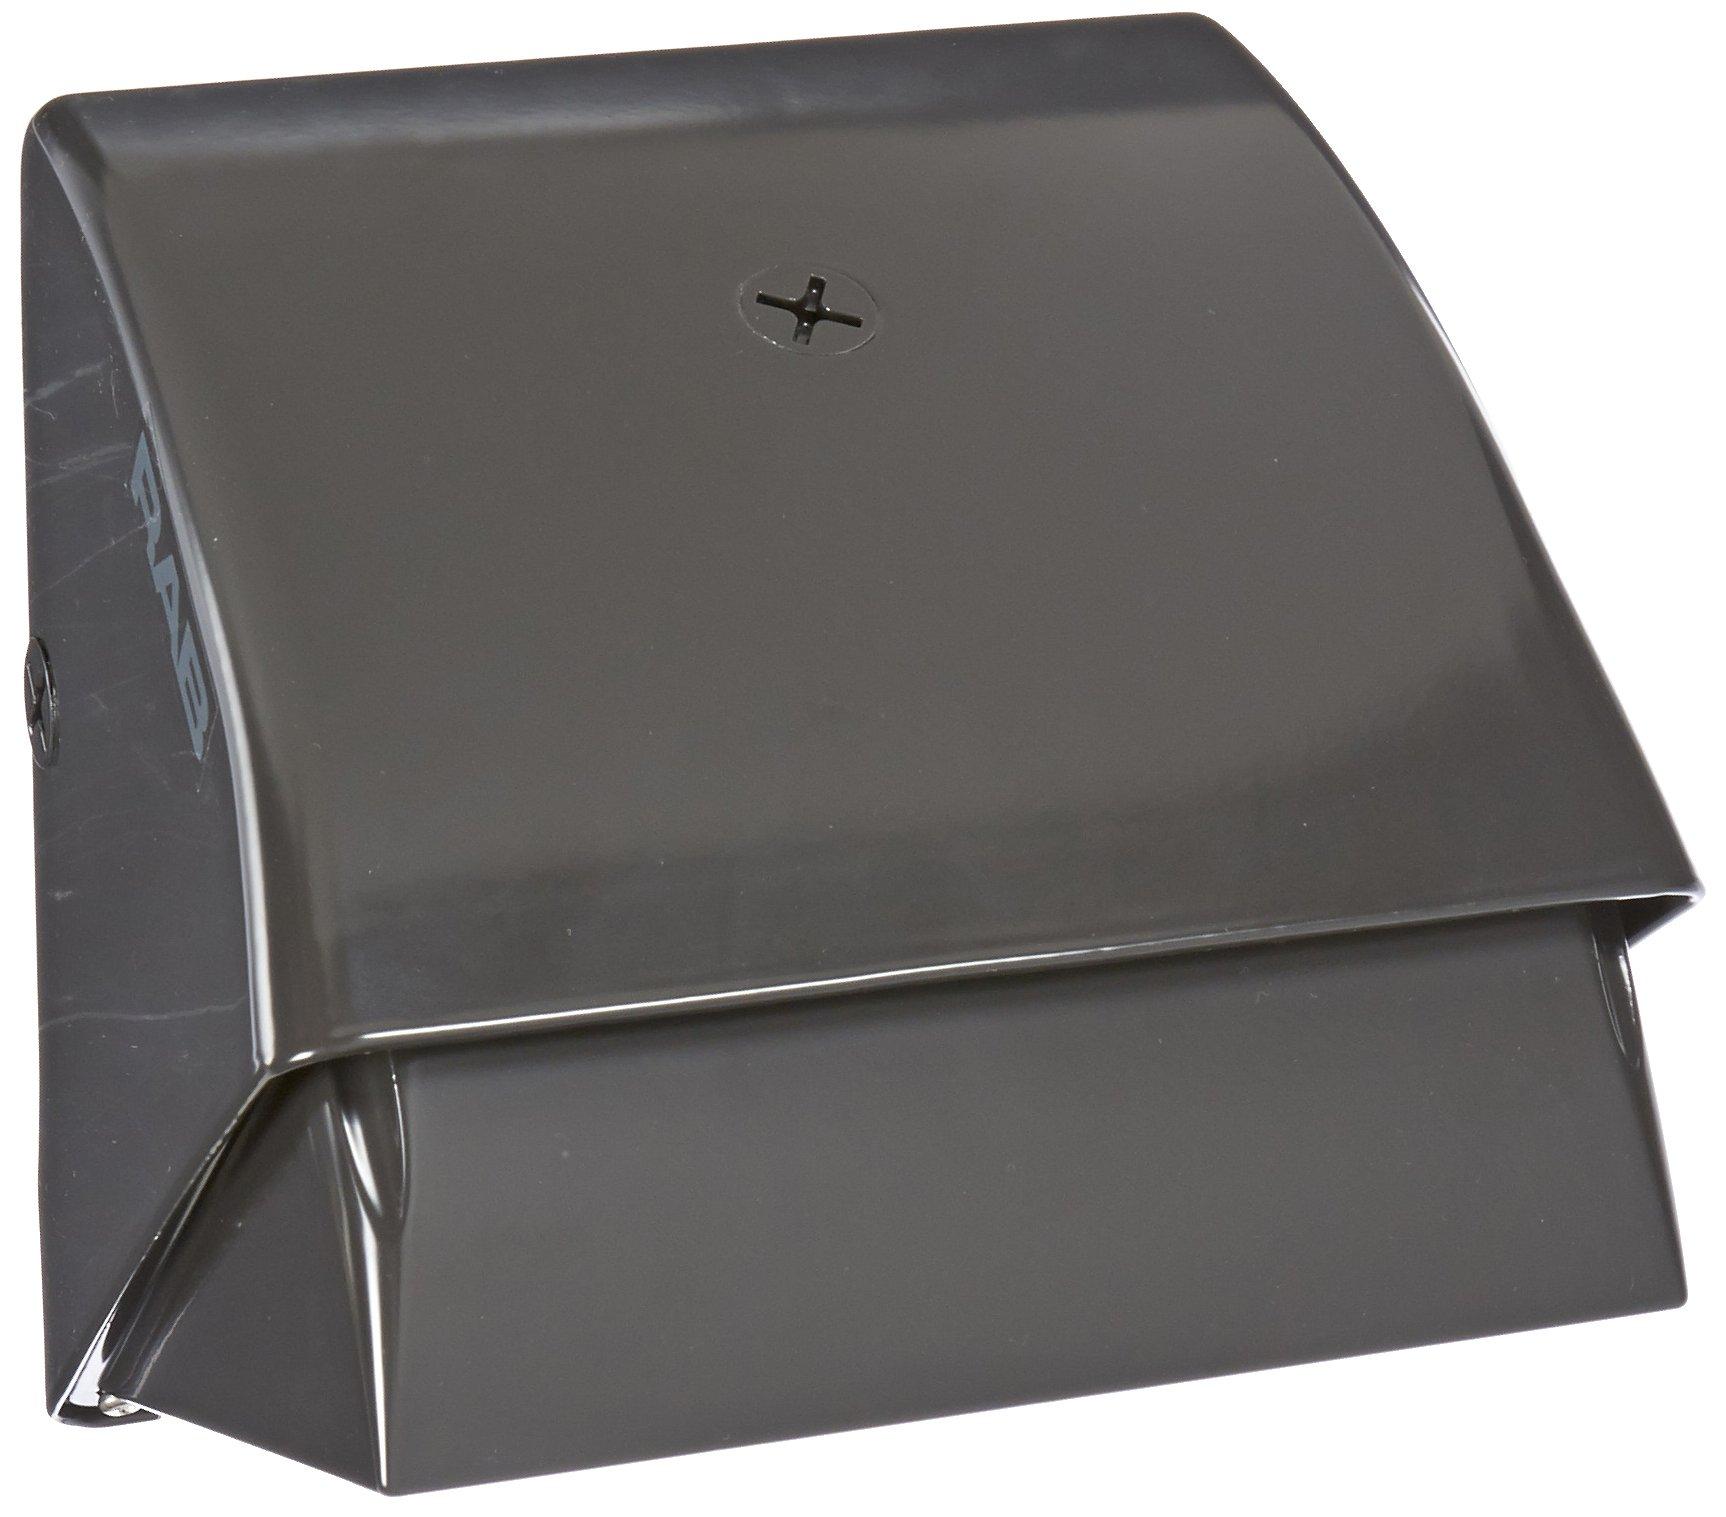 RAB Lighting WP1CSN35 WP1 High Pressure Sodium Wallpack with Cutoff Glare Shield, ED17 Type, Aluminum, 35W Power, 2250 Lumens, 120V, Bronze Color